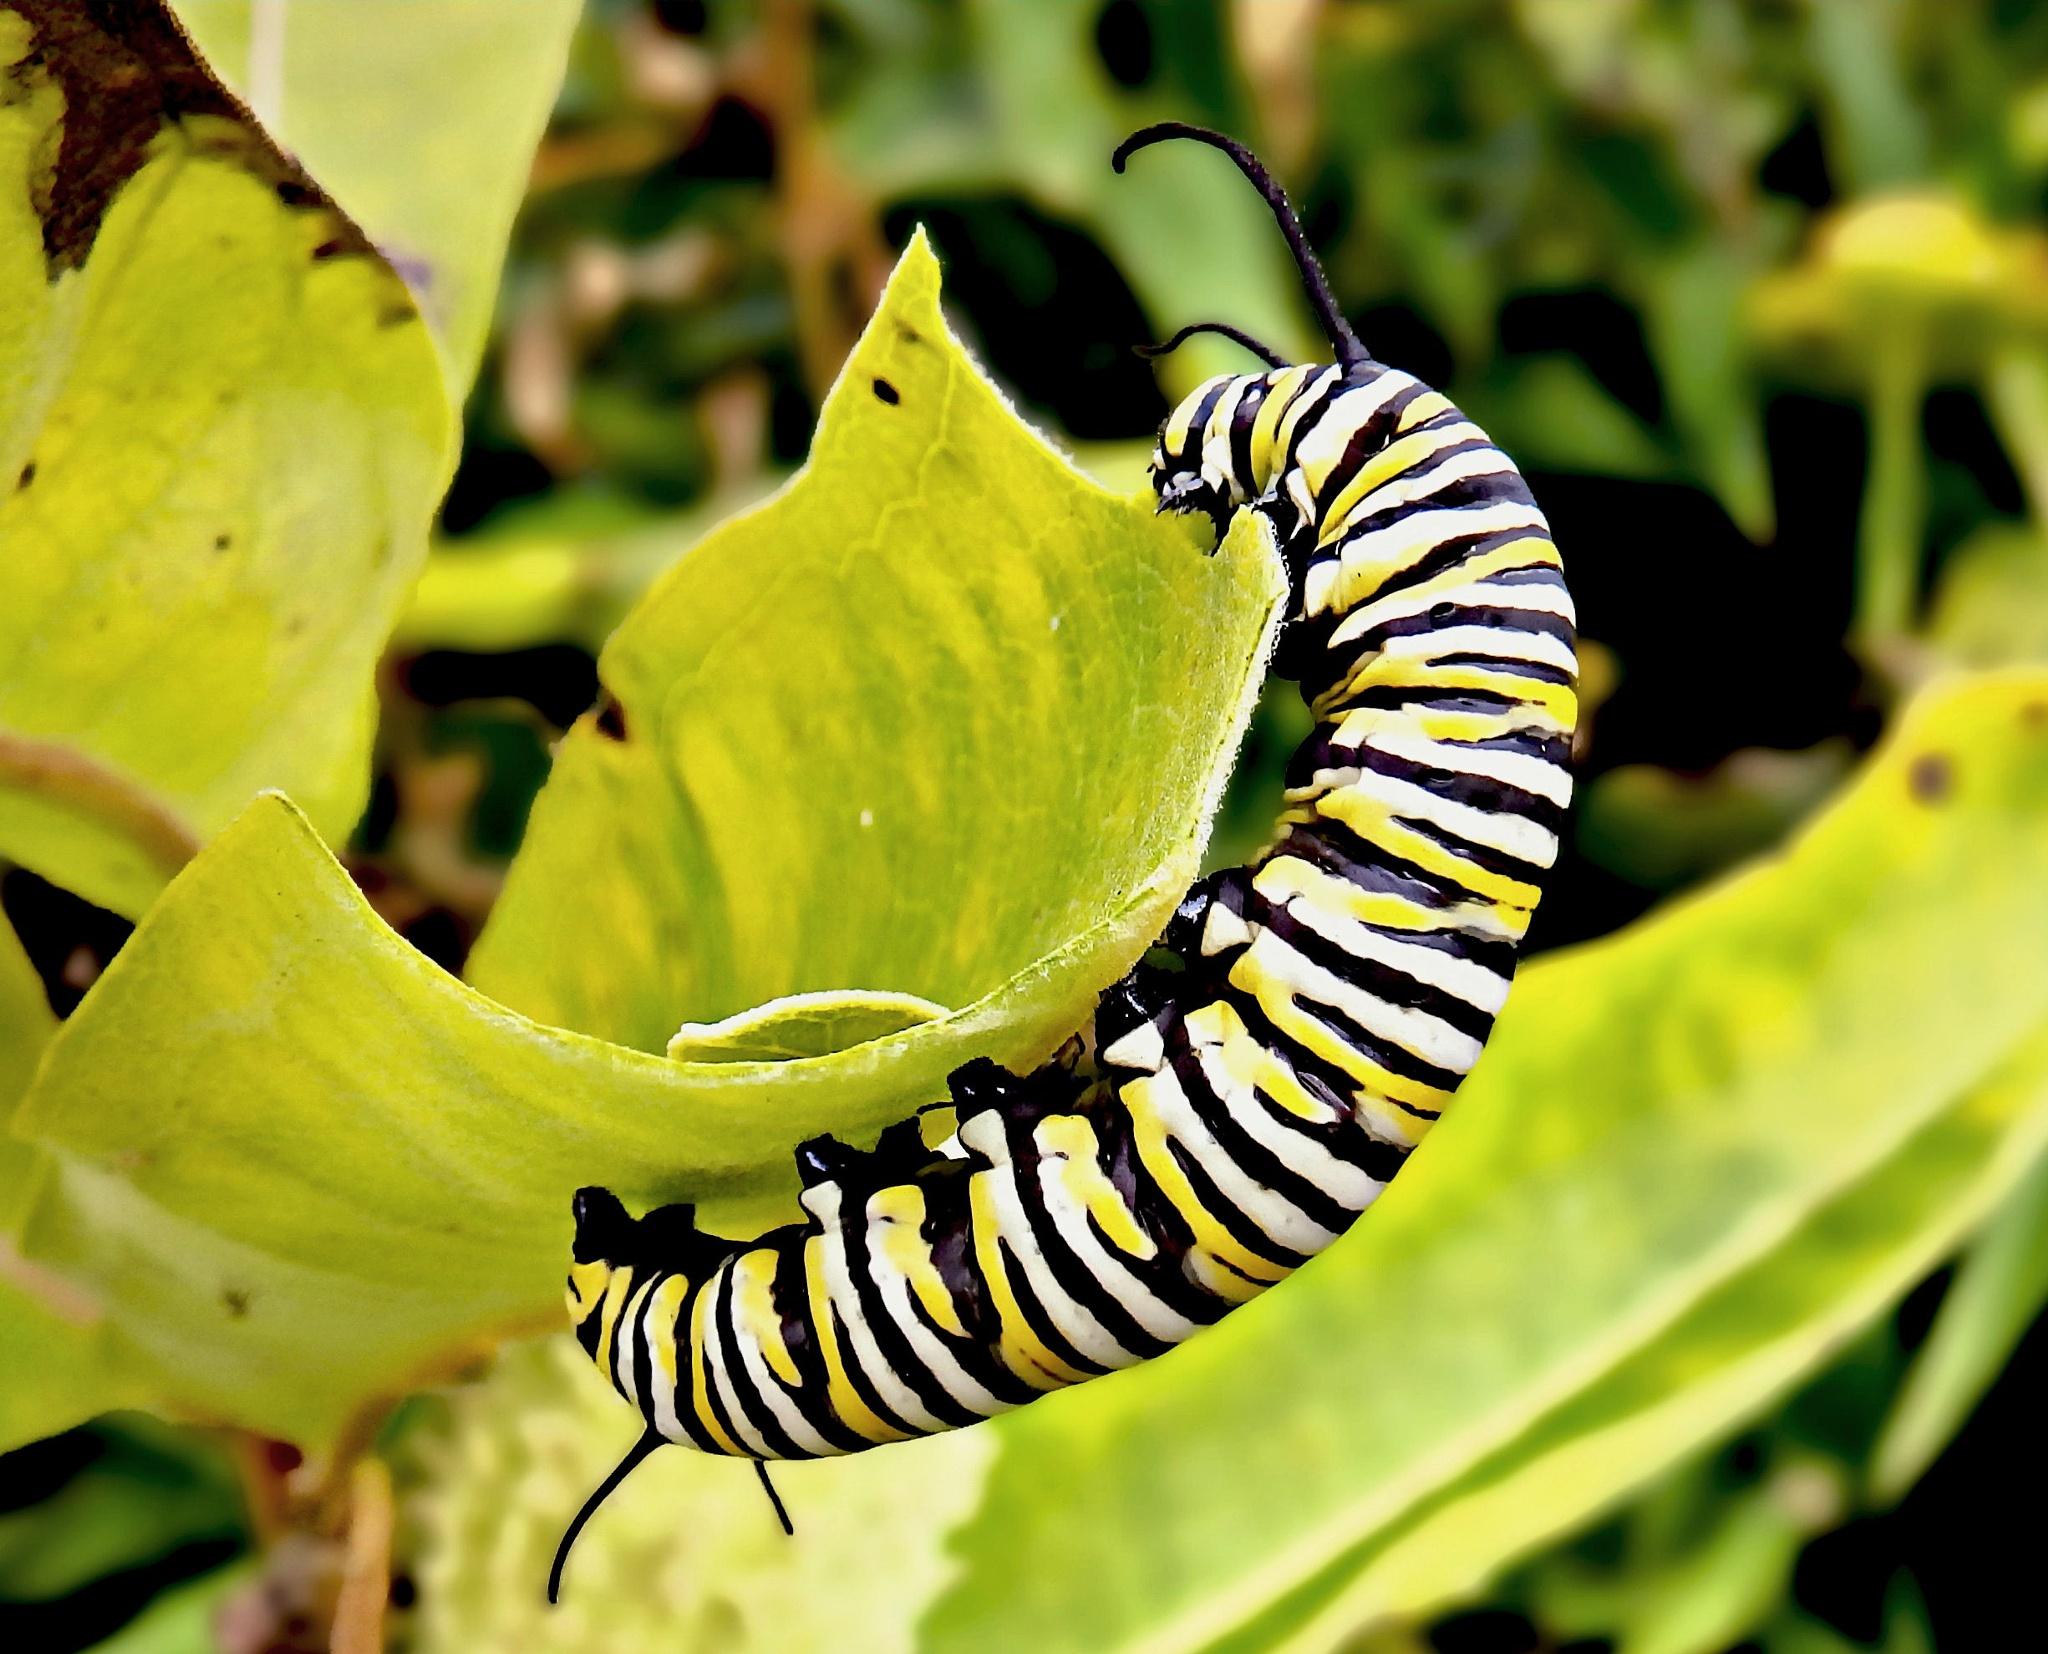 Hungry Caterpillar  by Darlene Eastin